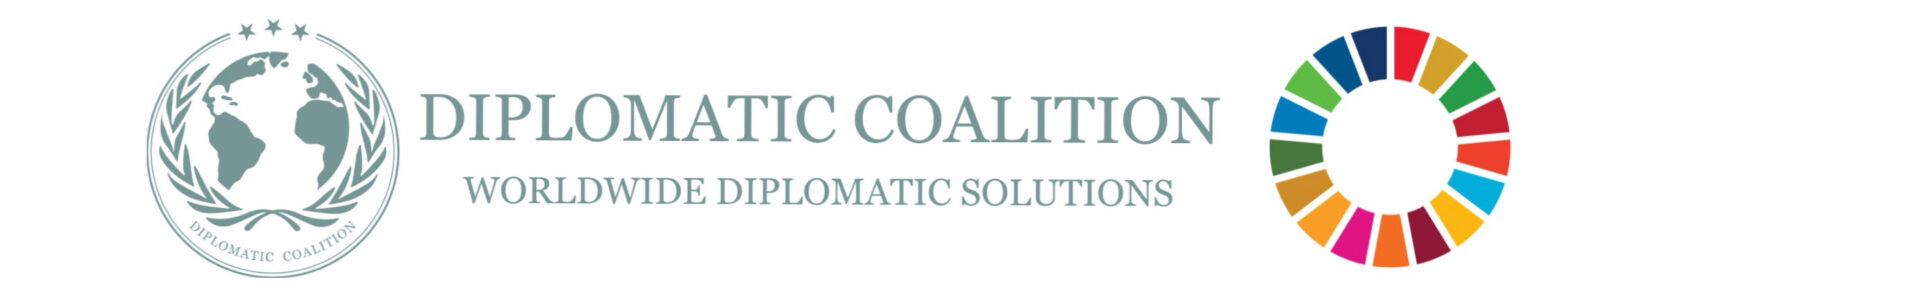 Diplomatic Coalition